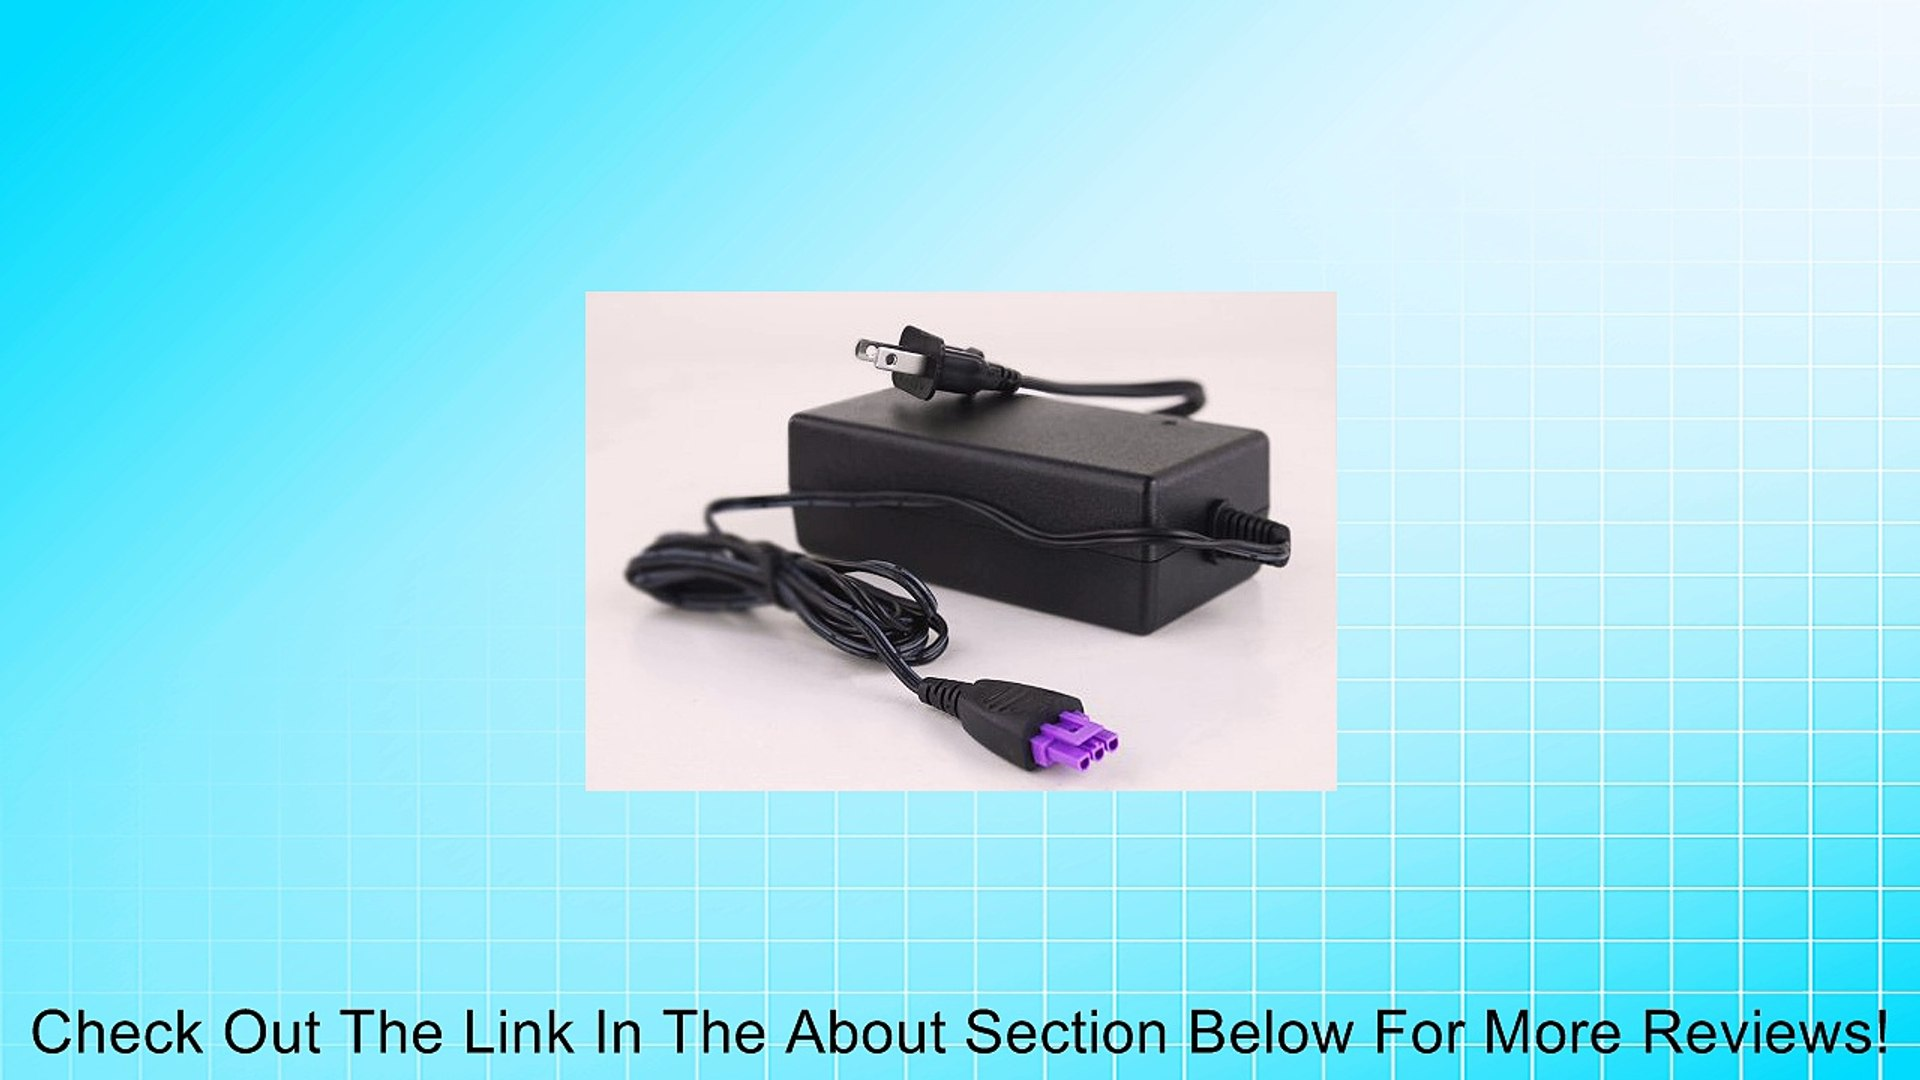 NEW Genuine AC Adapter HP OfficeJet 4500 All-In-One Inkjet Printer Power Supply